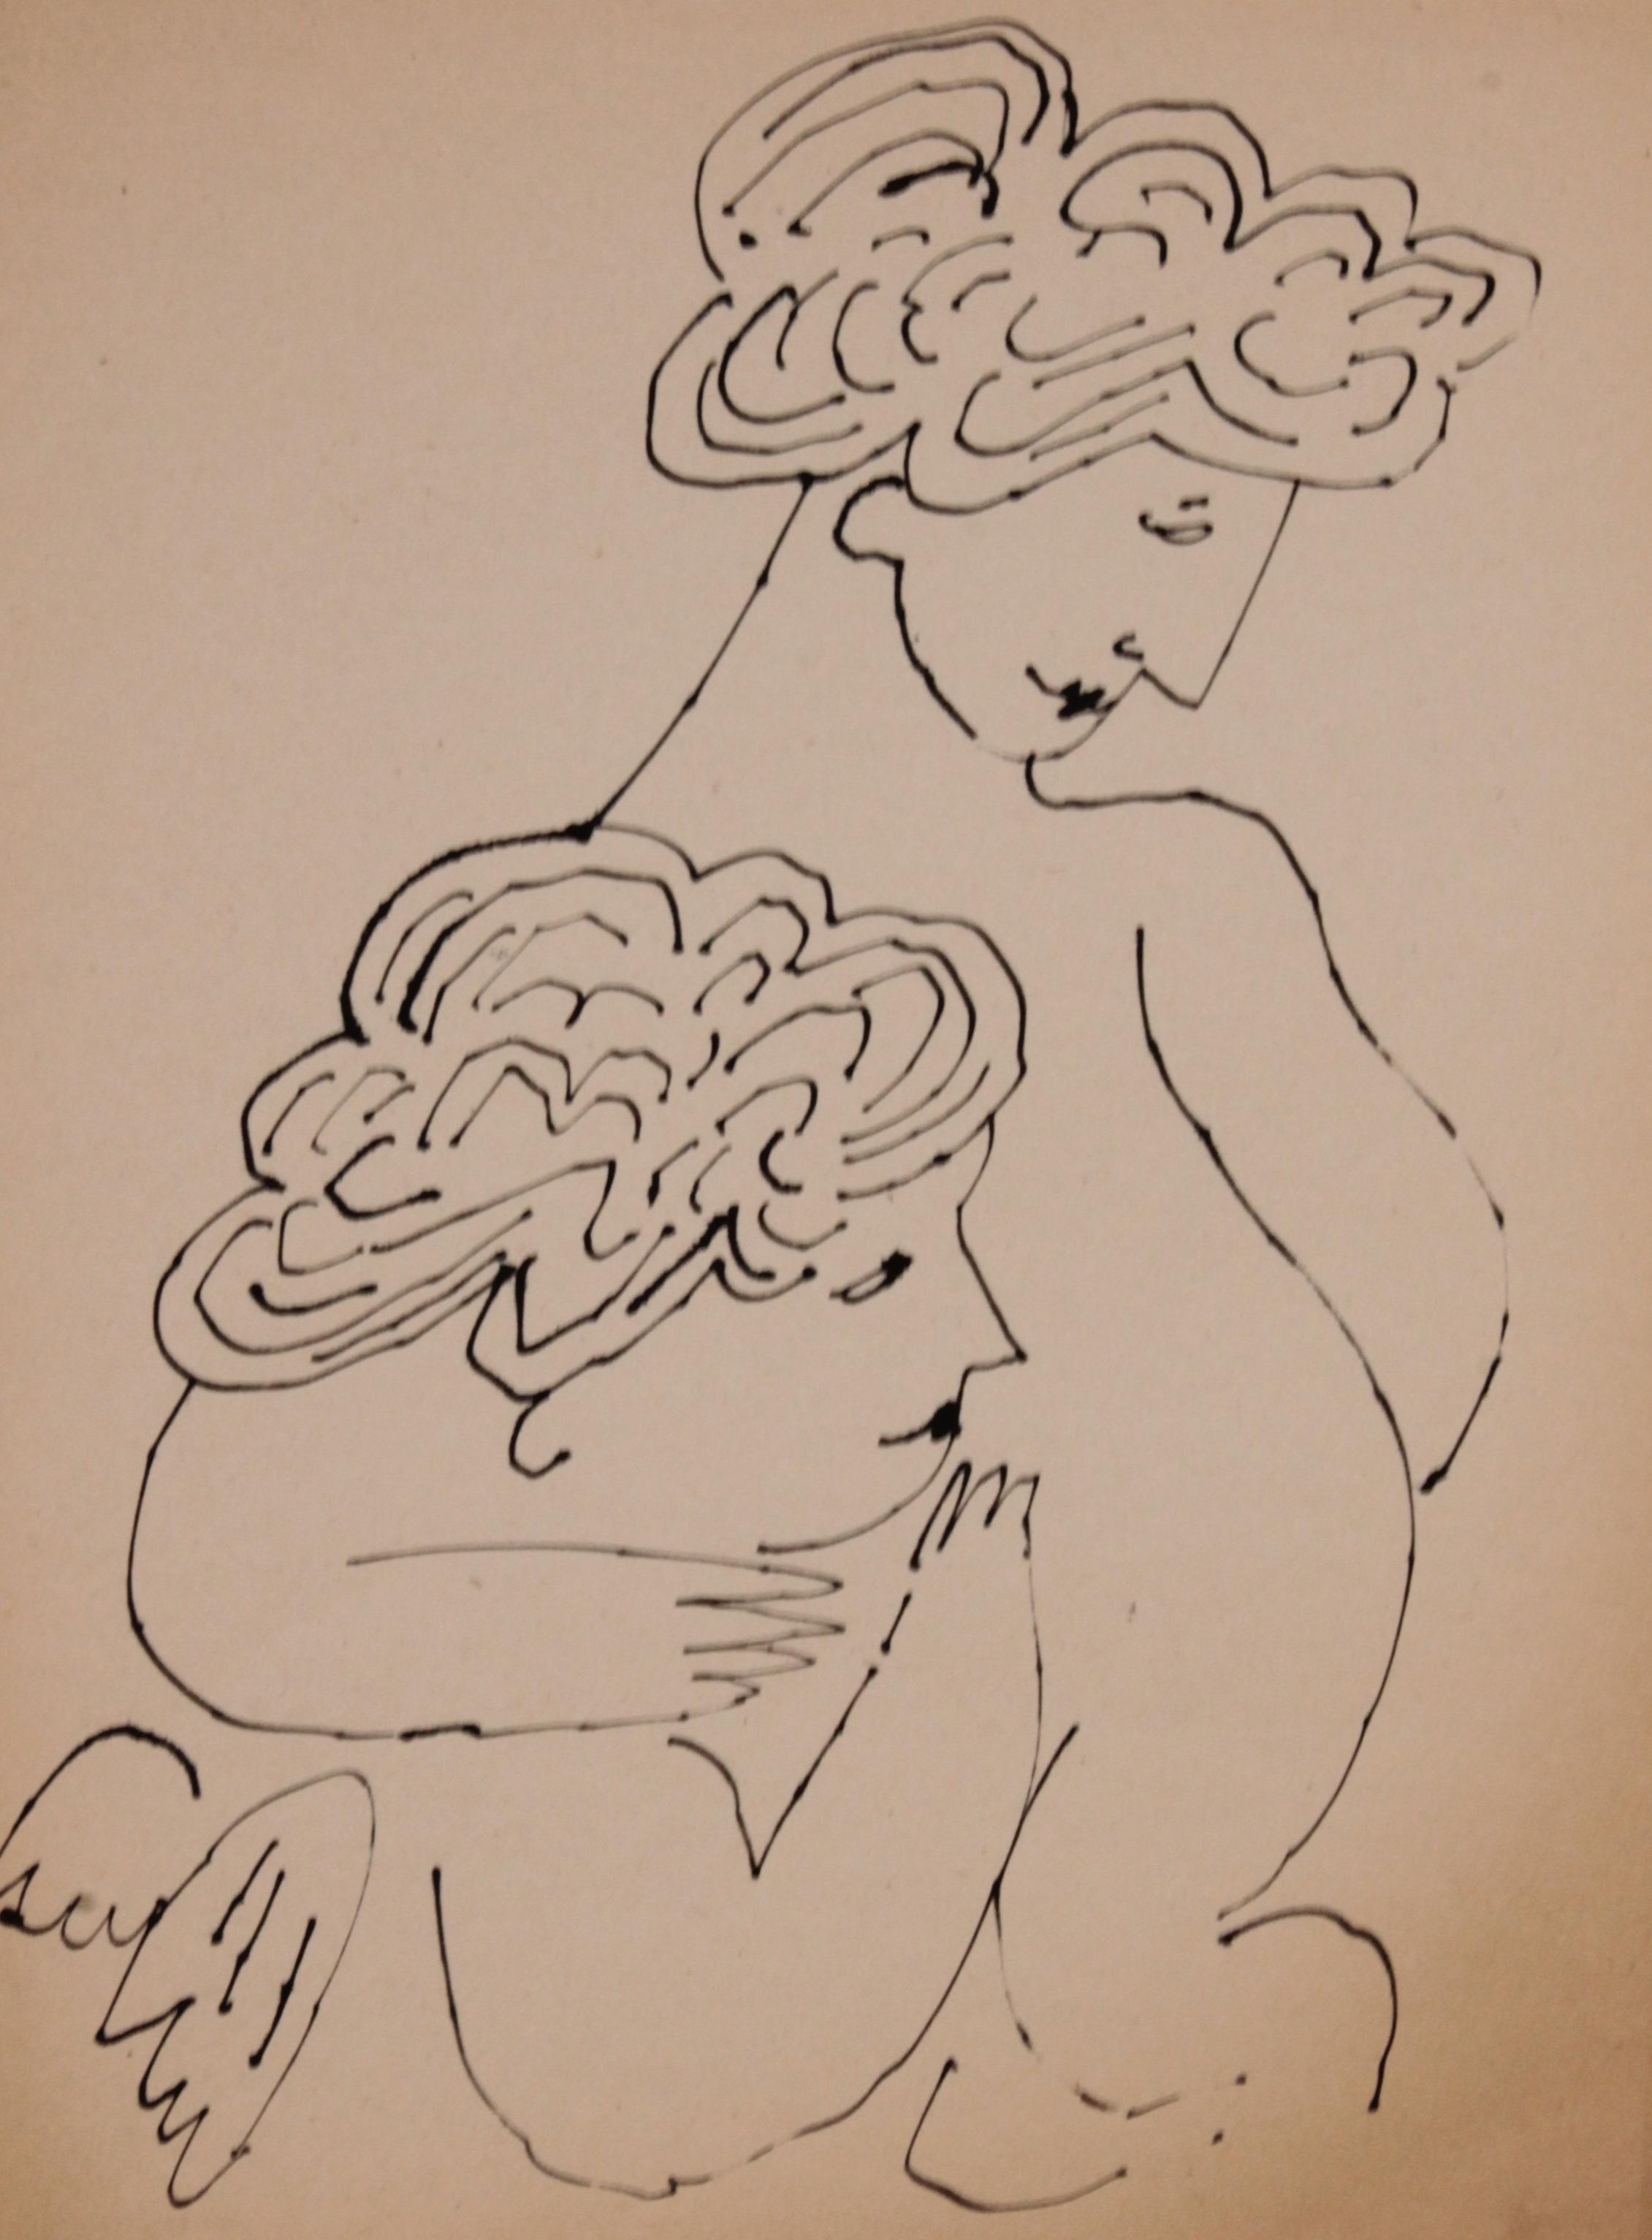 Andy Warhol - Two Cherubs Embrace